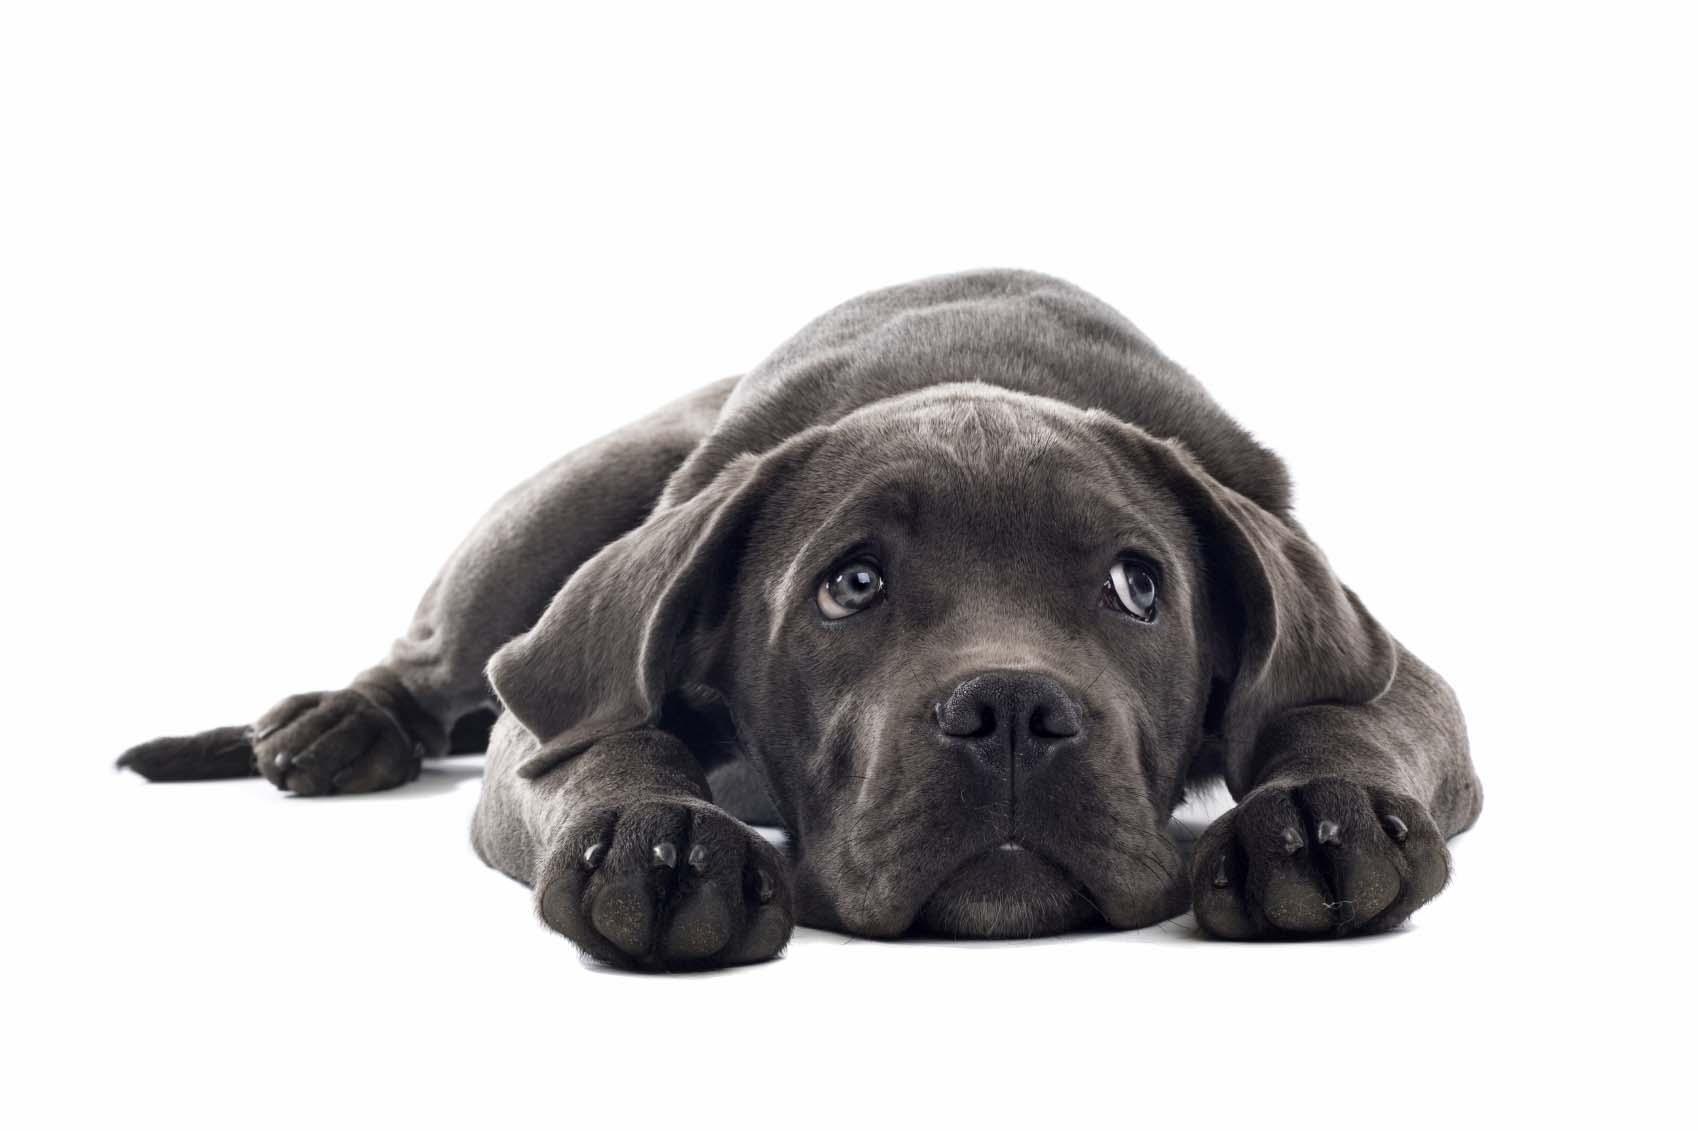 Premium Tufflock Dog Collars, Dog Harness